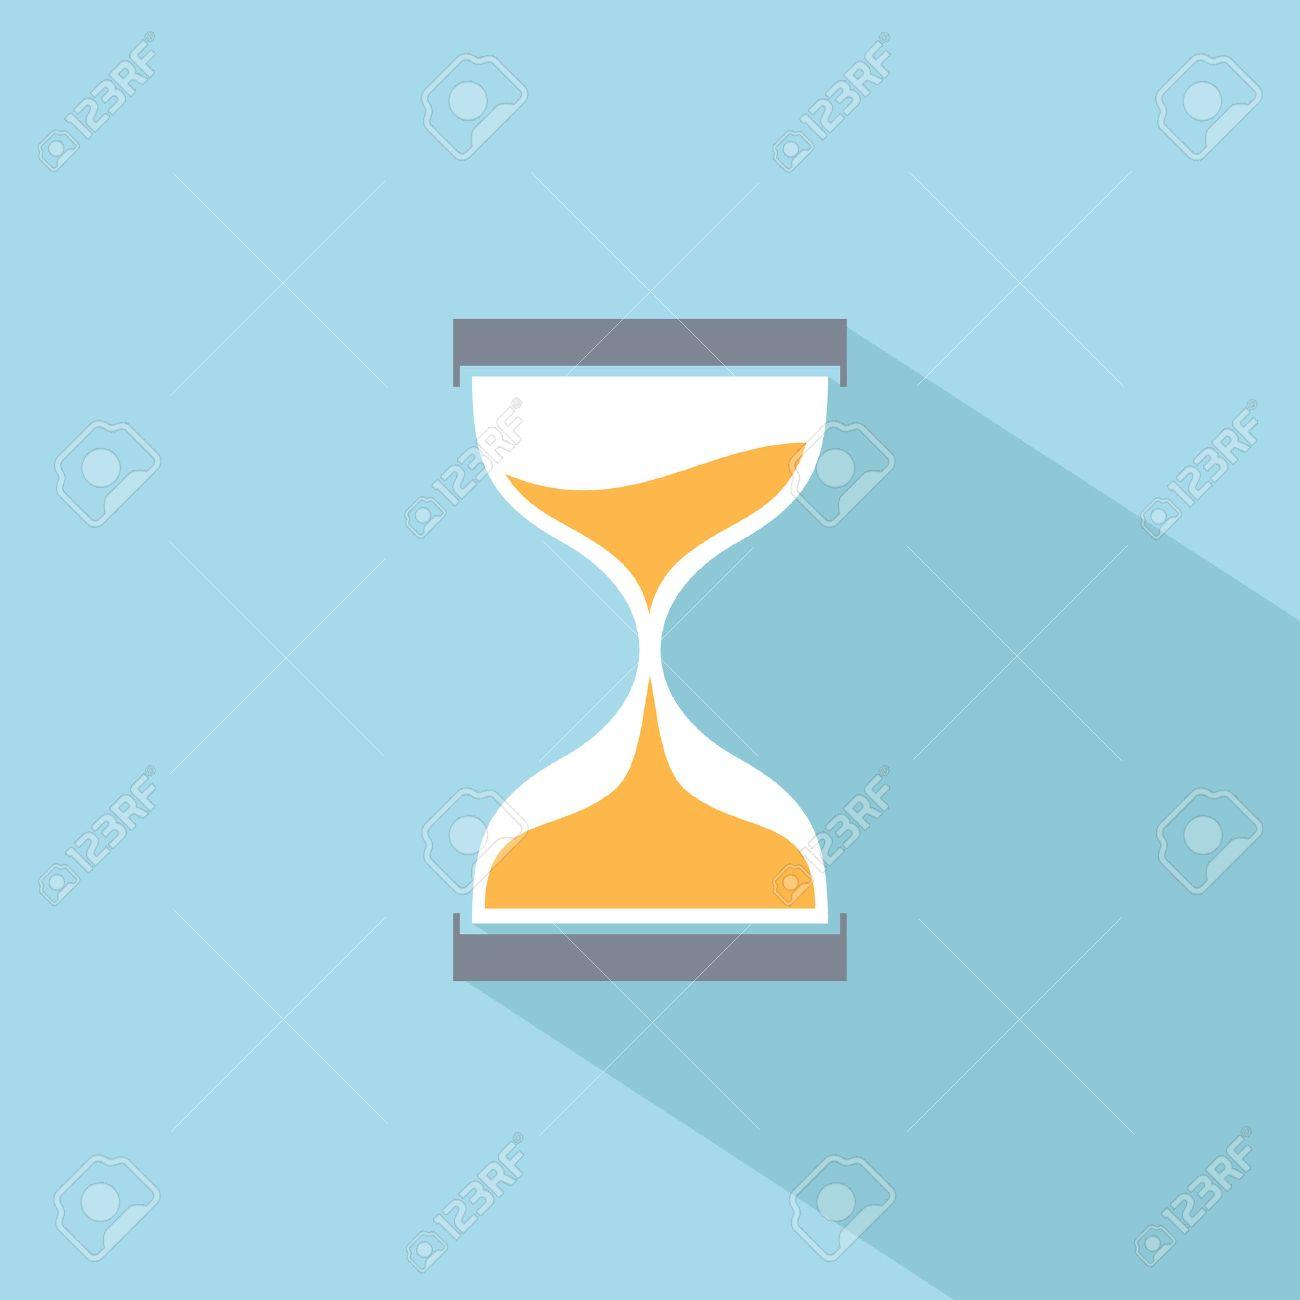 Sand clock flat icon - 41502975